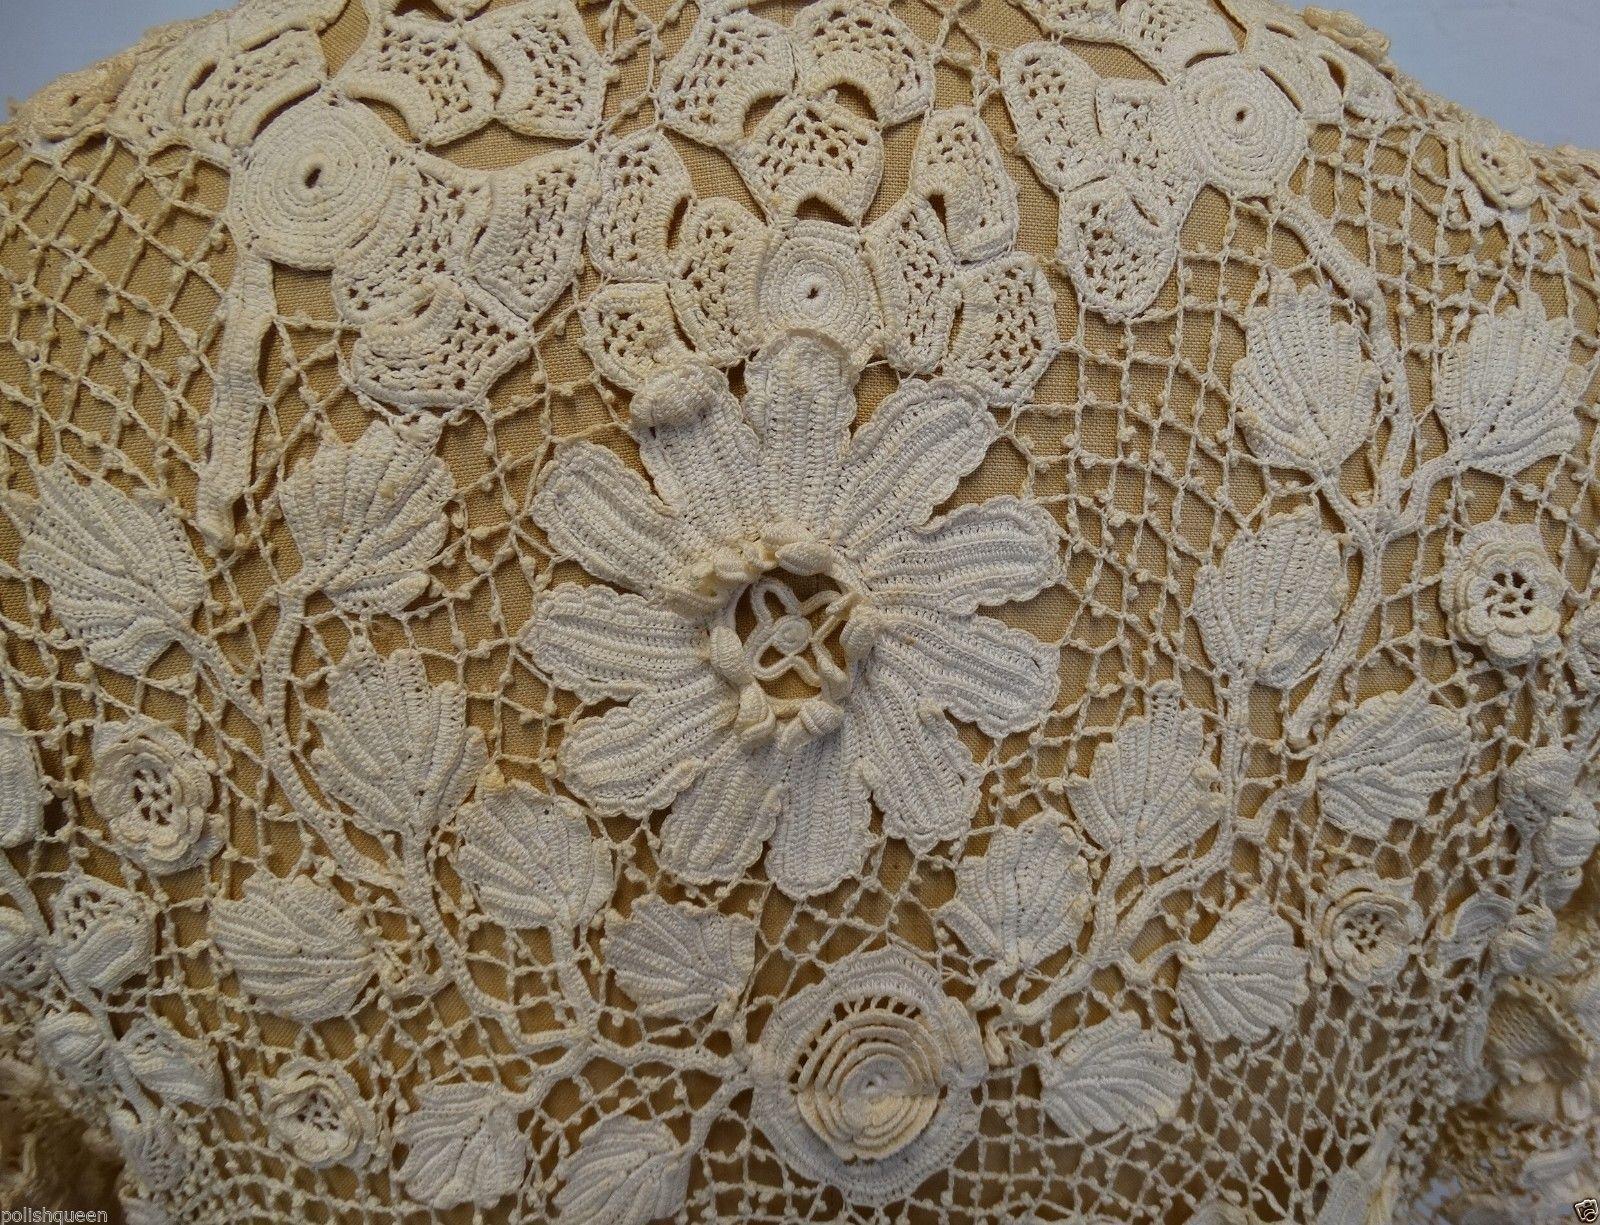 1900 IVORY IRISH CROCHET LACE JACKET. Detail